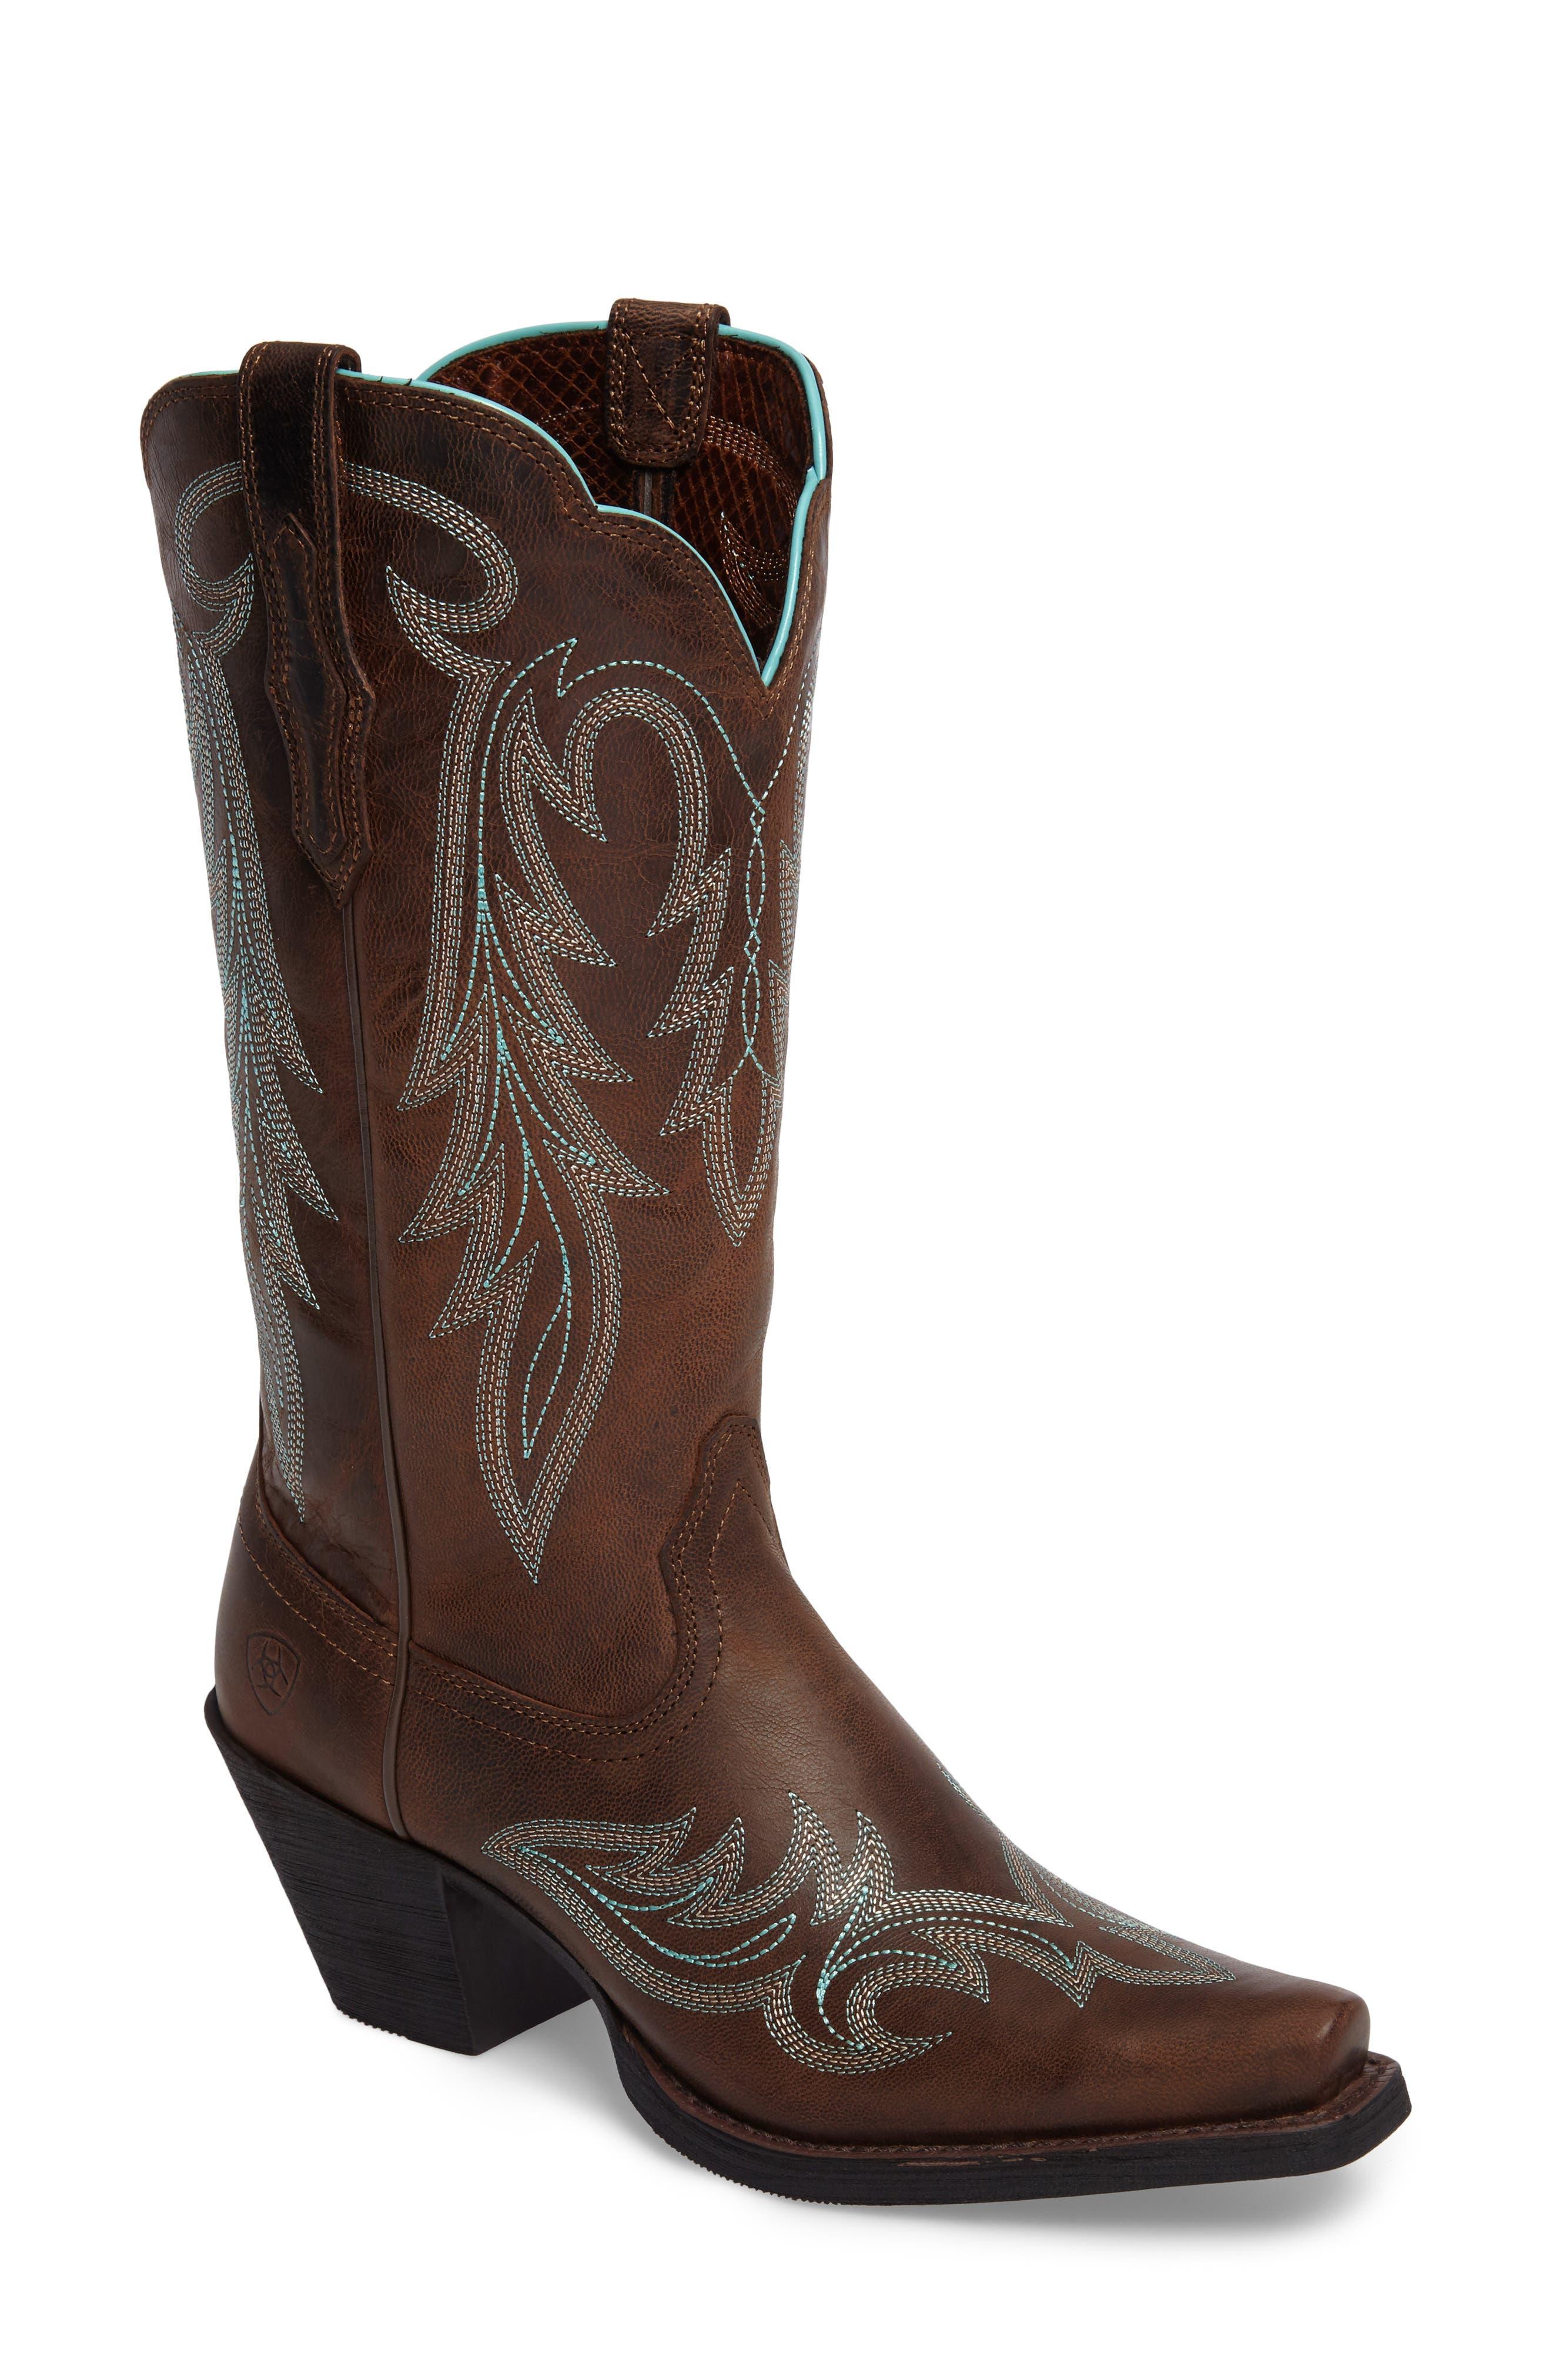 Alternate Image 1 Selected - Ariat Round Up Renegade Western Boot (Women)